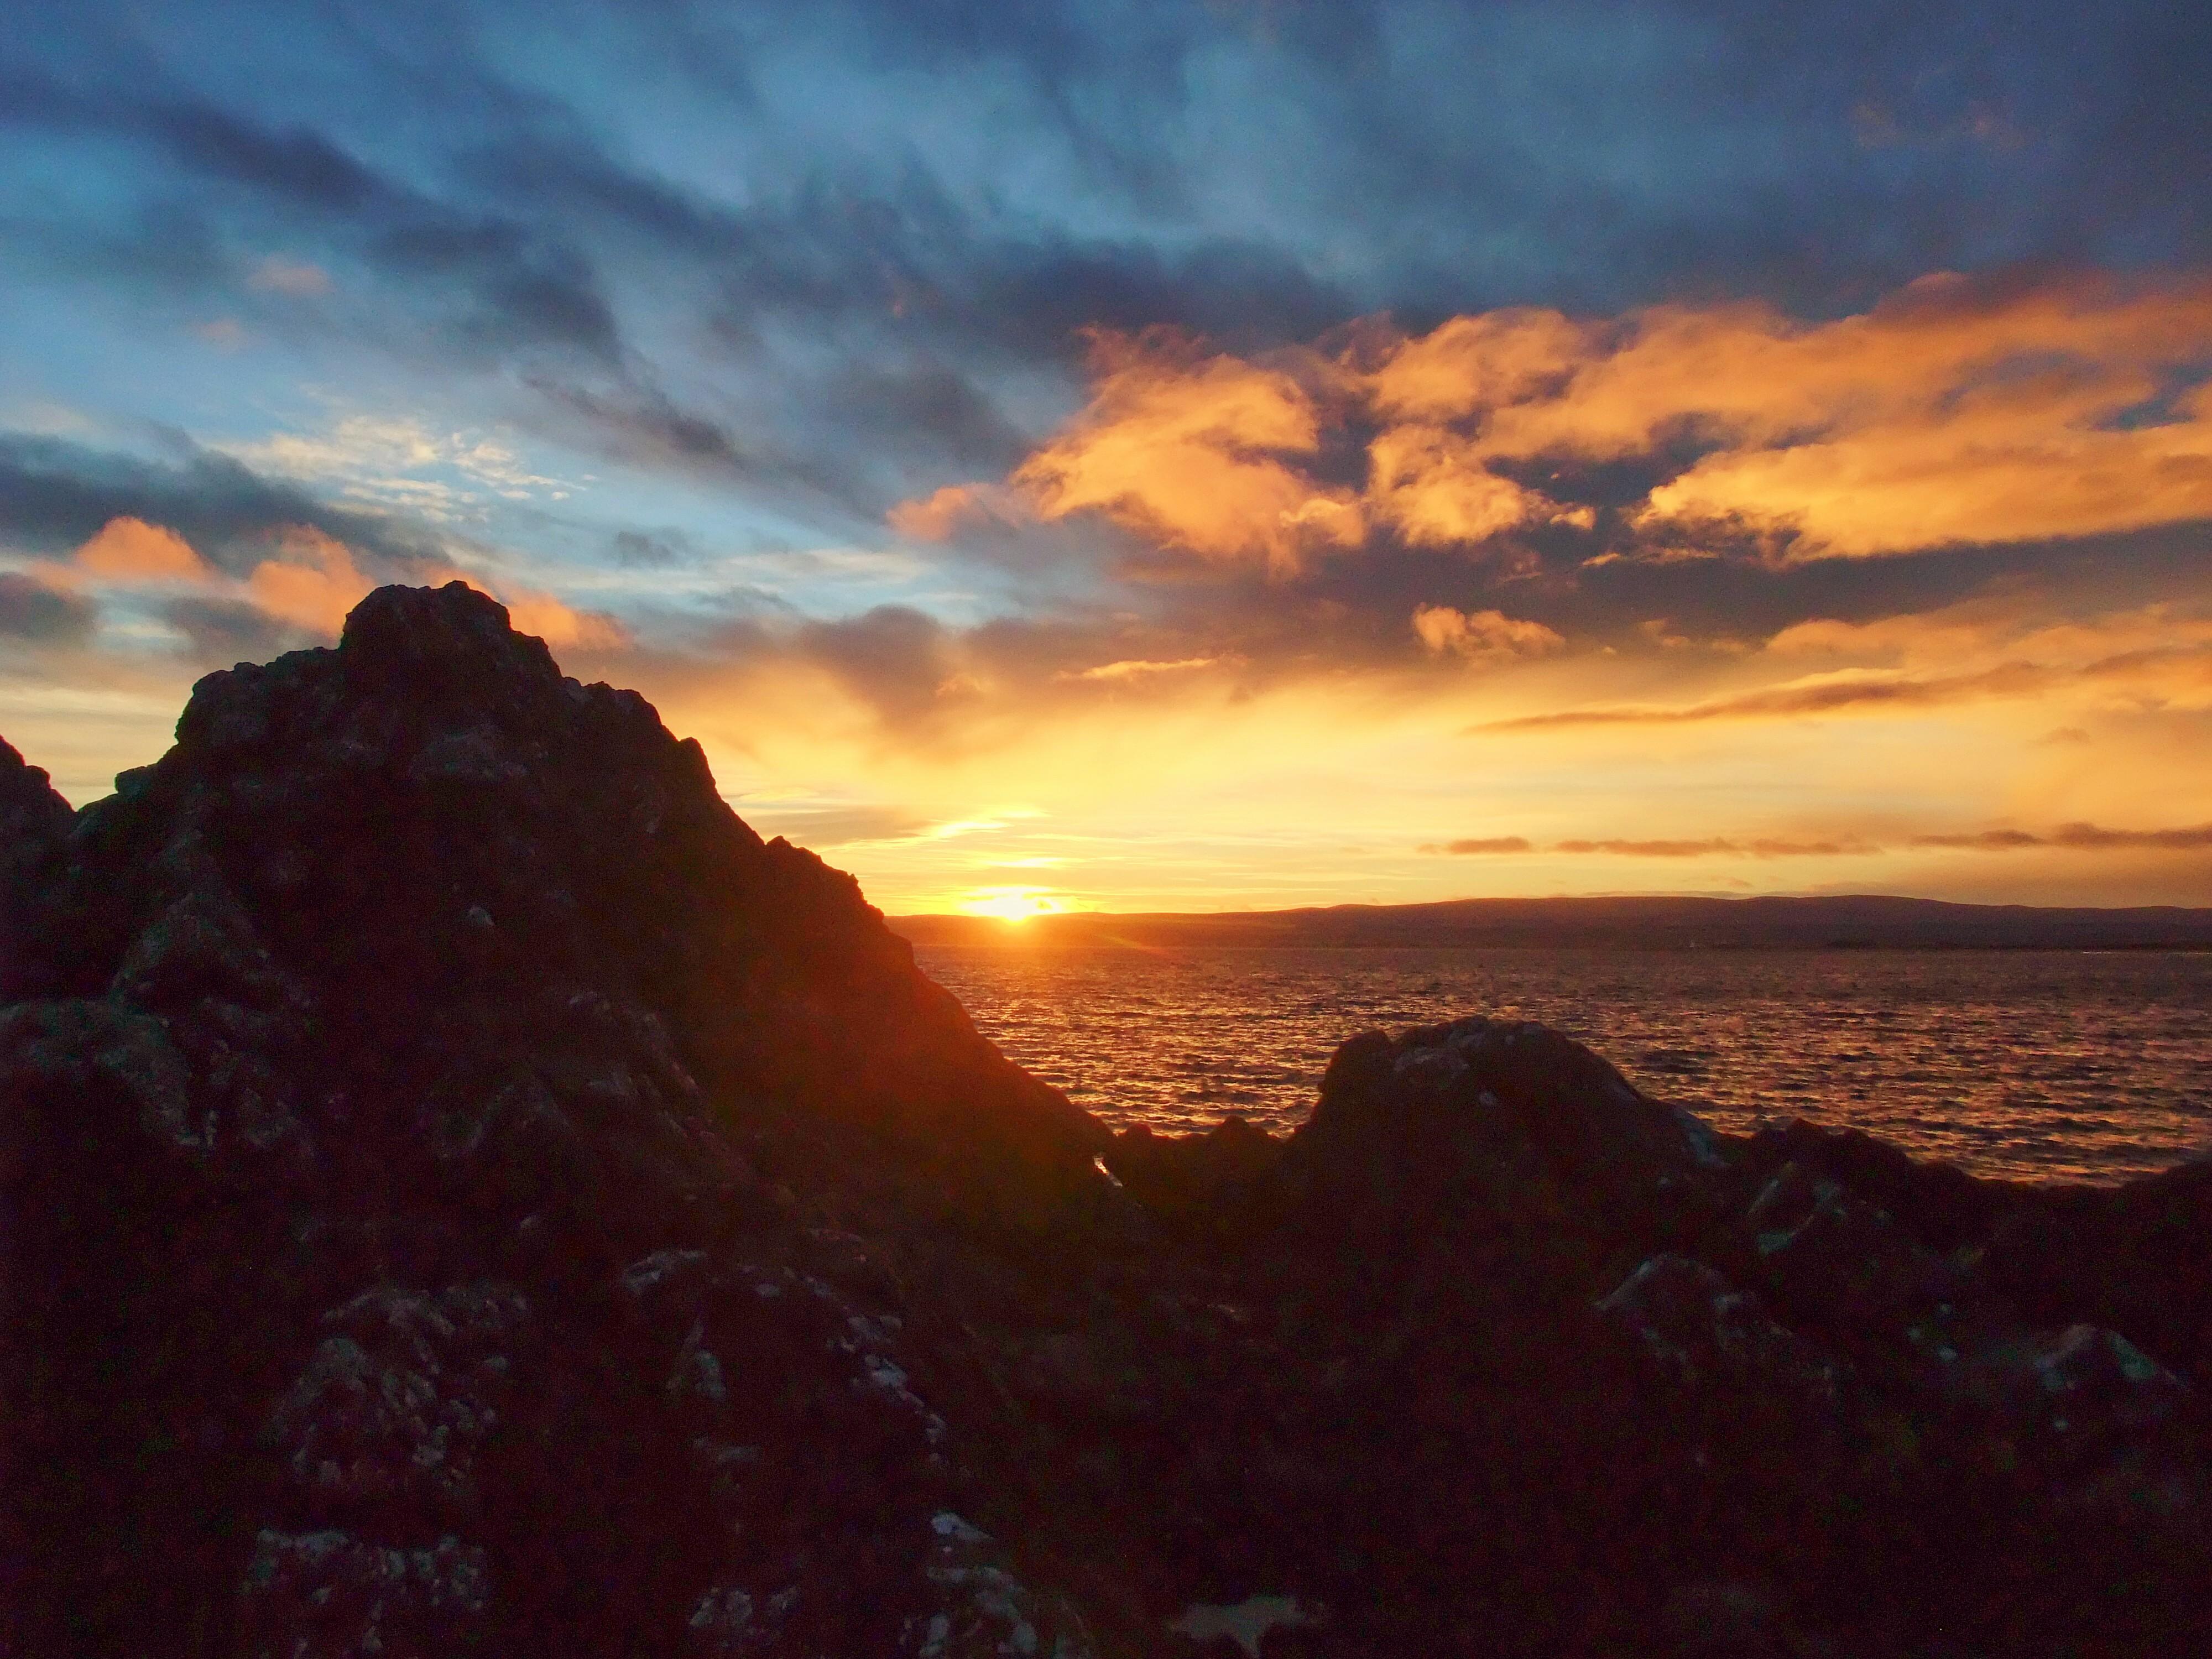 sunrise over rocks